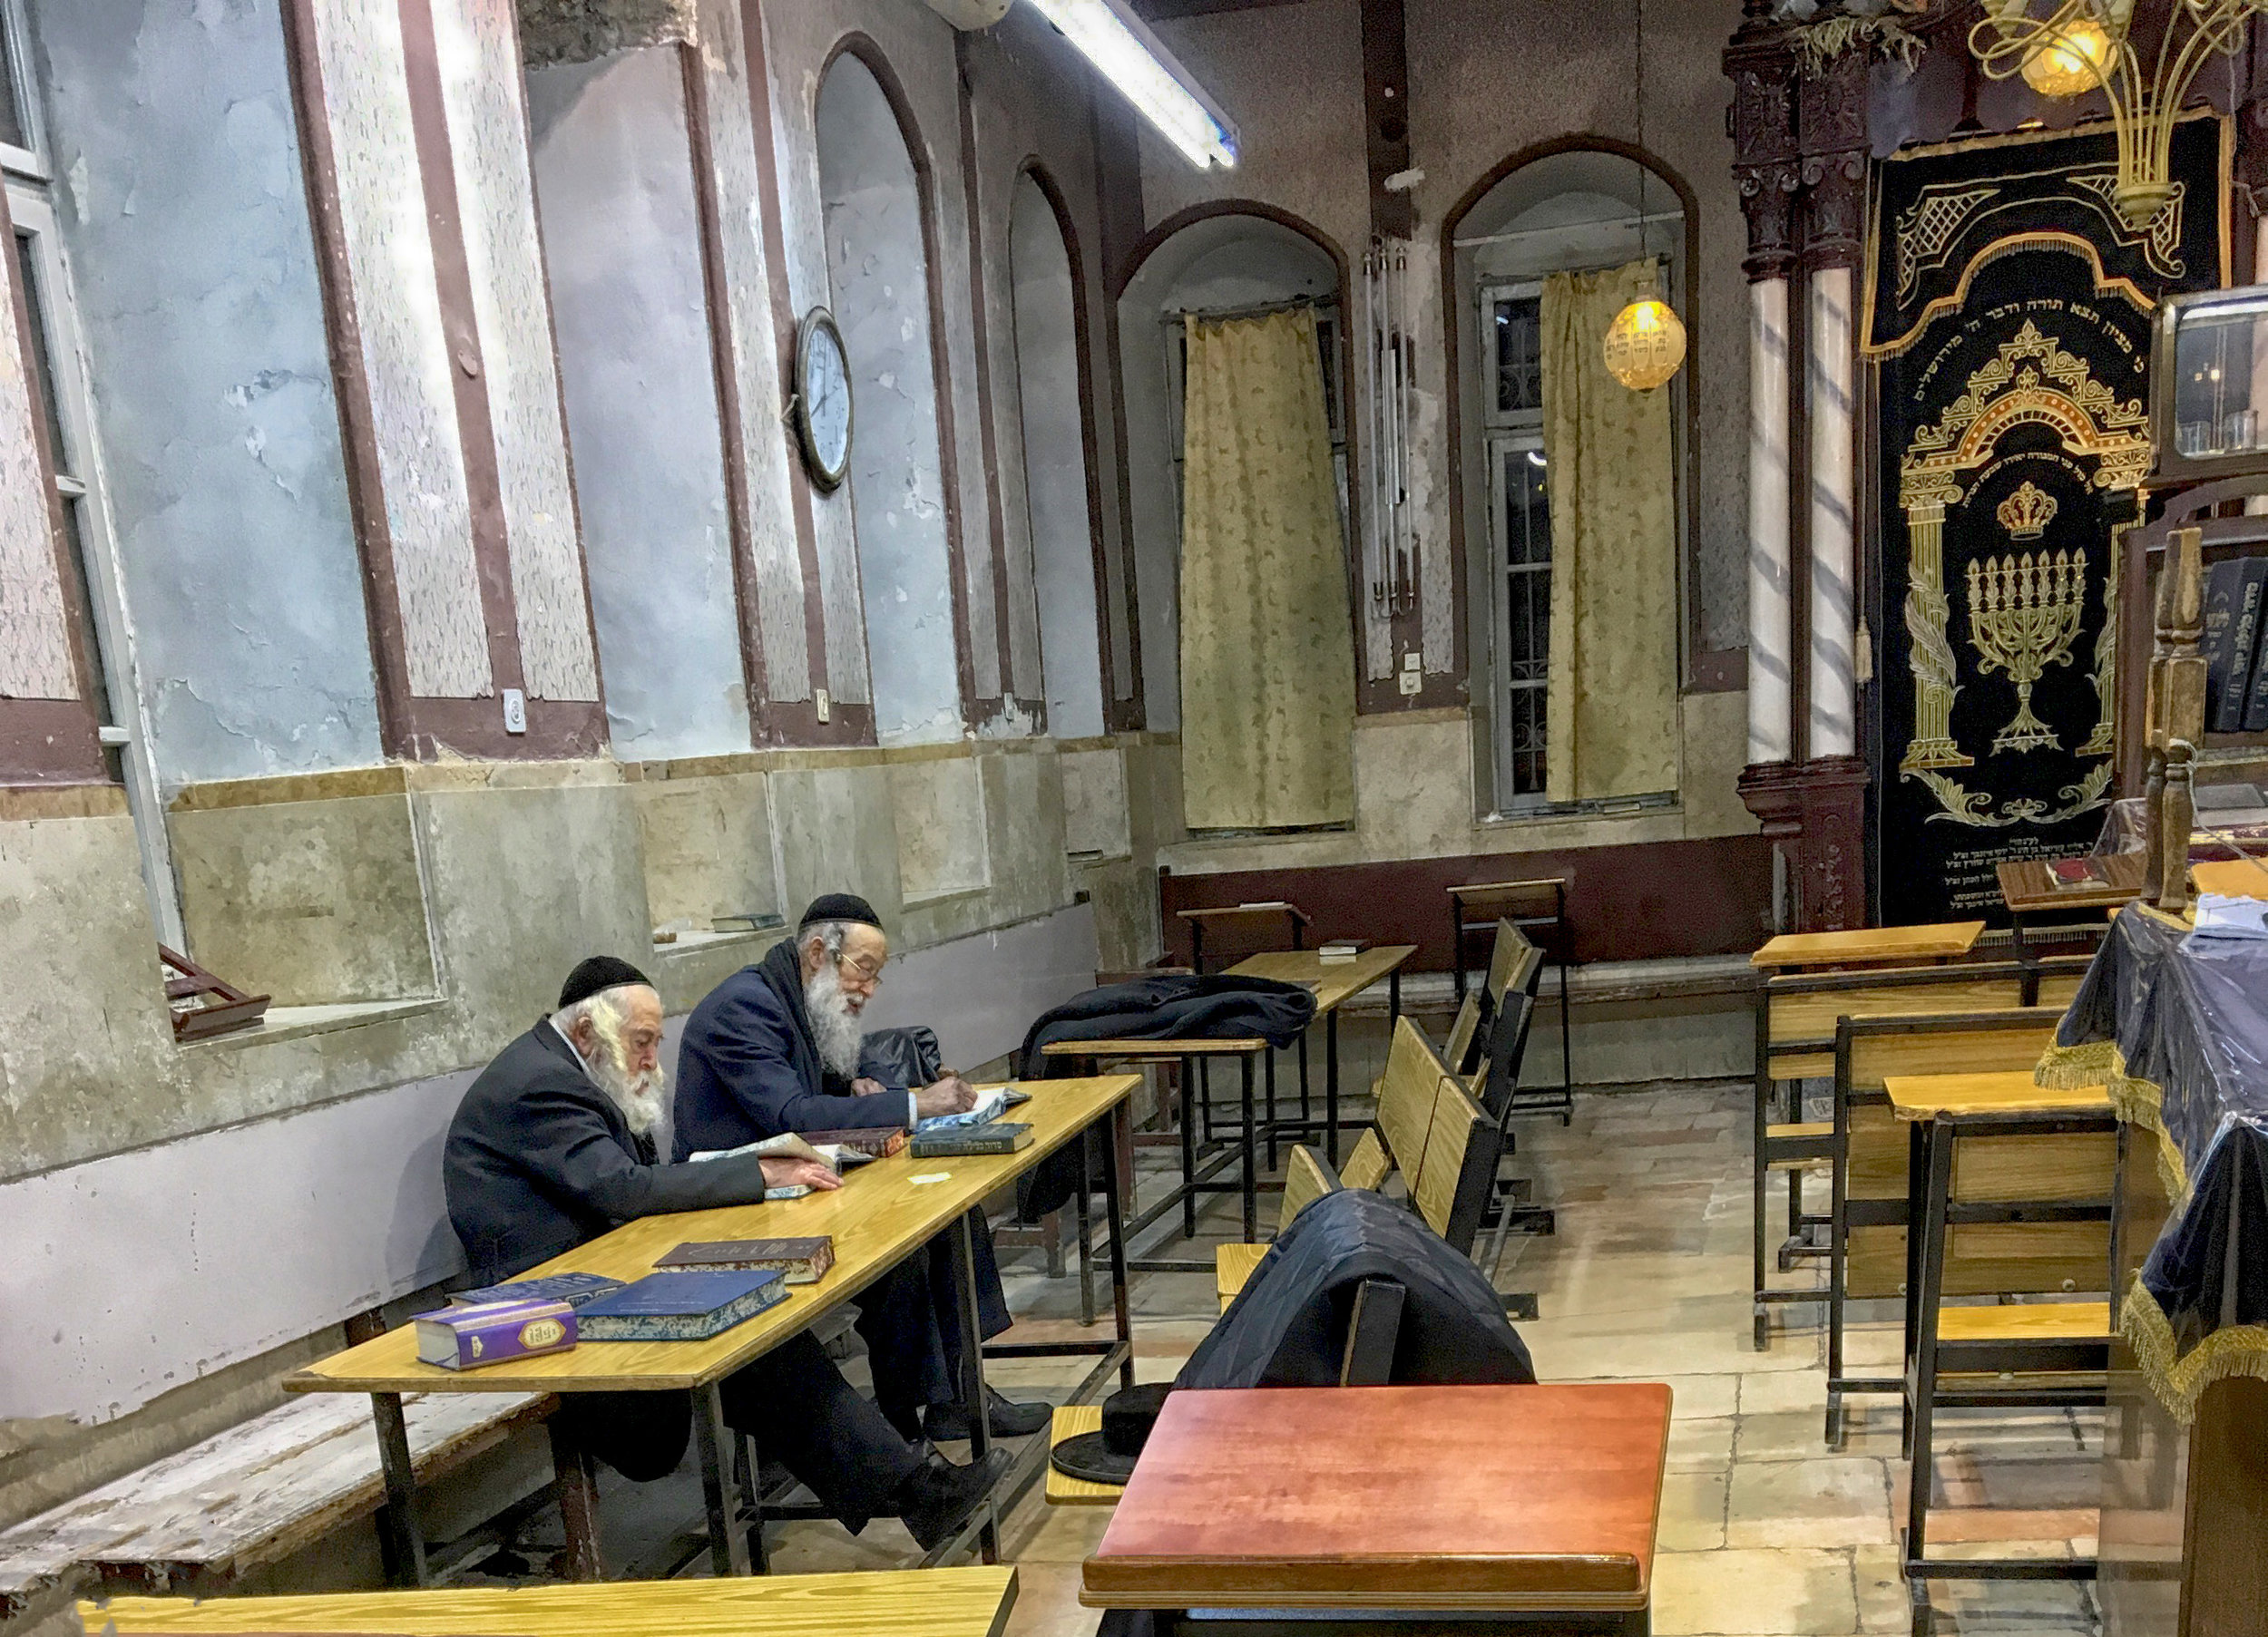 Synagogue, Mea Shearim, Jerusalem